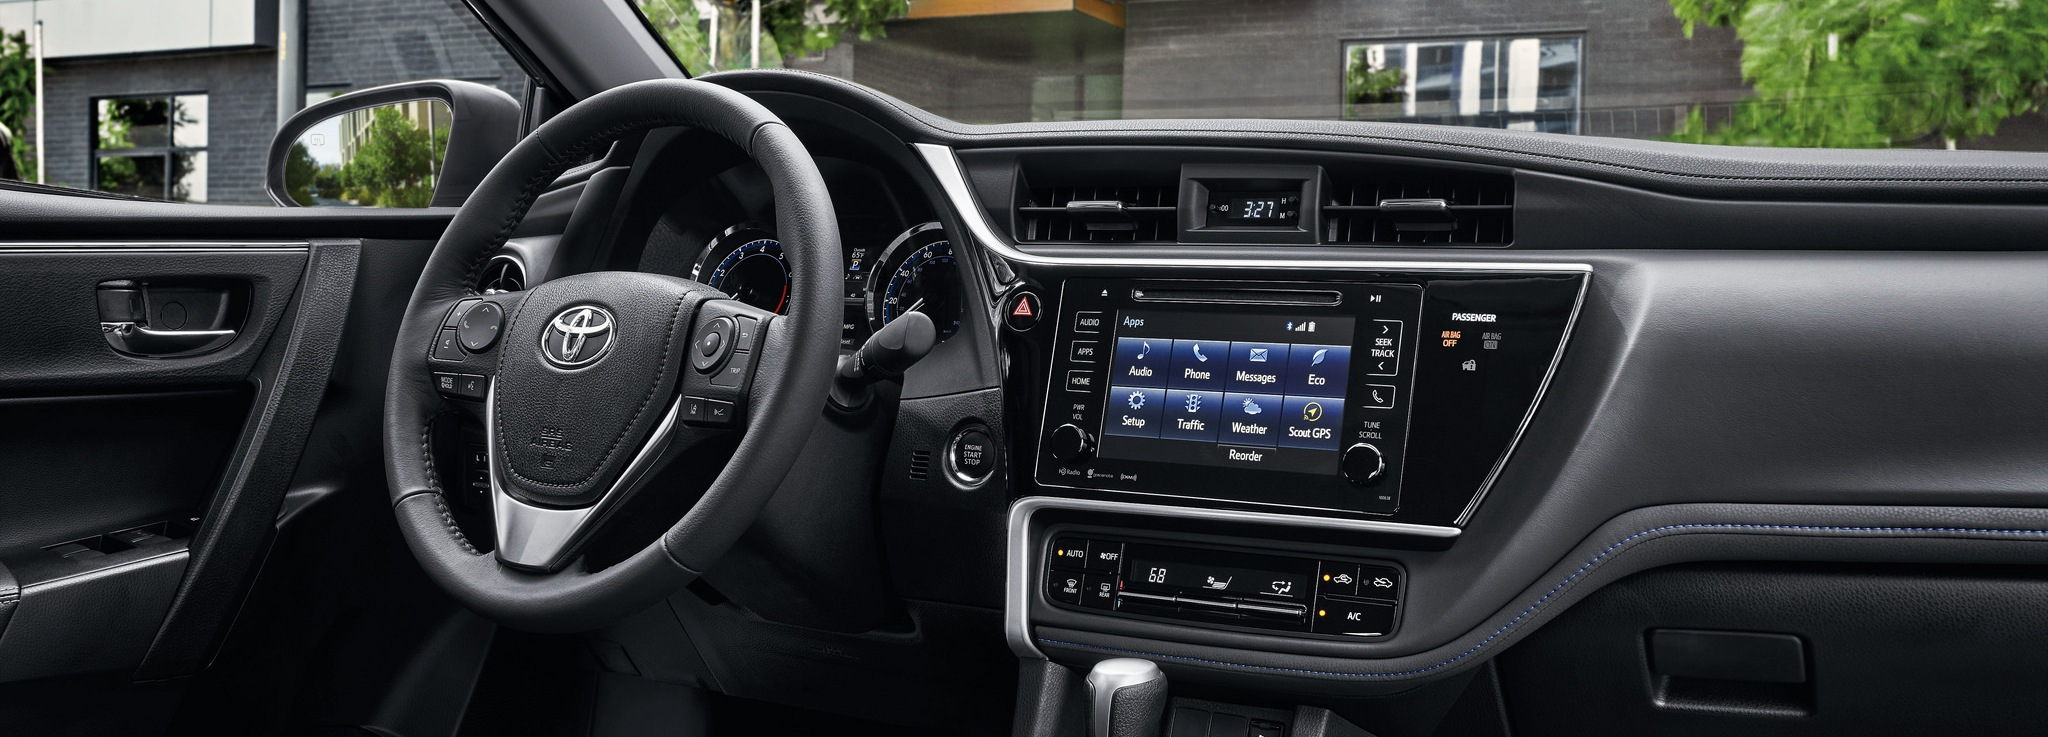 2017 Toyota Corolla Interior with Entune Audio